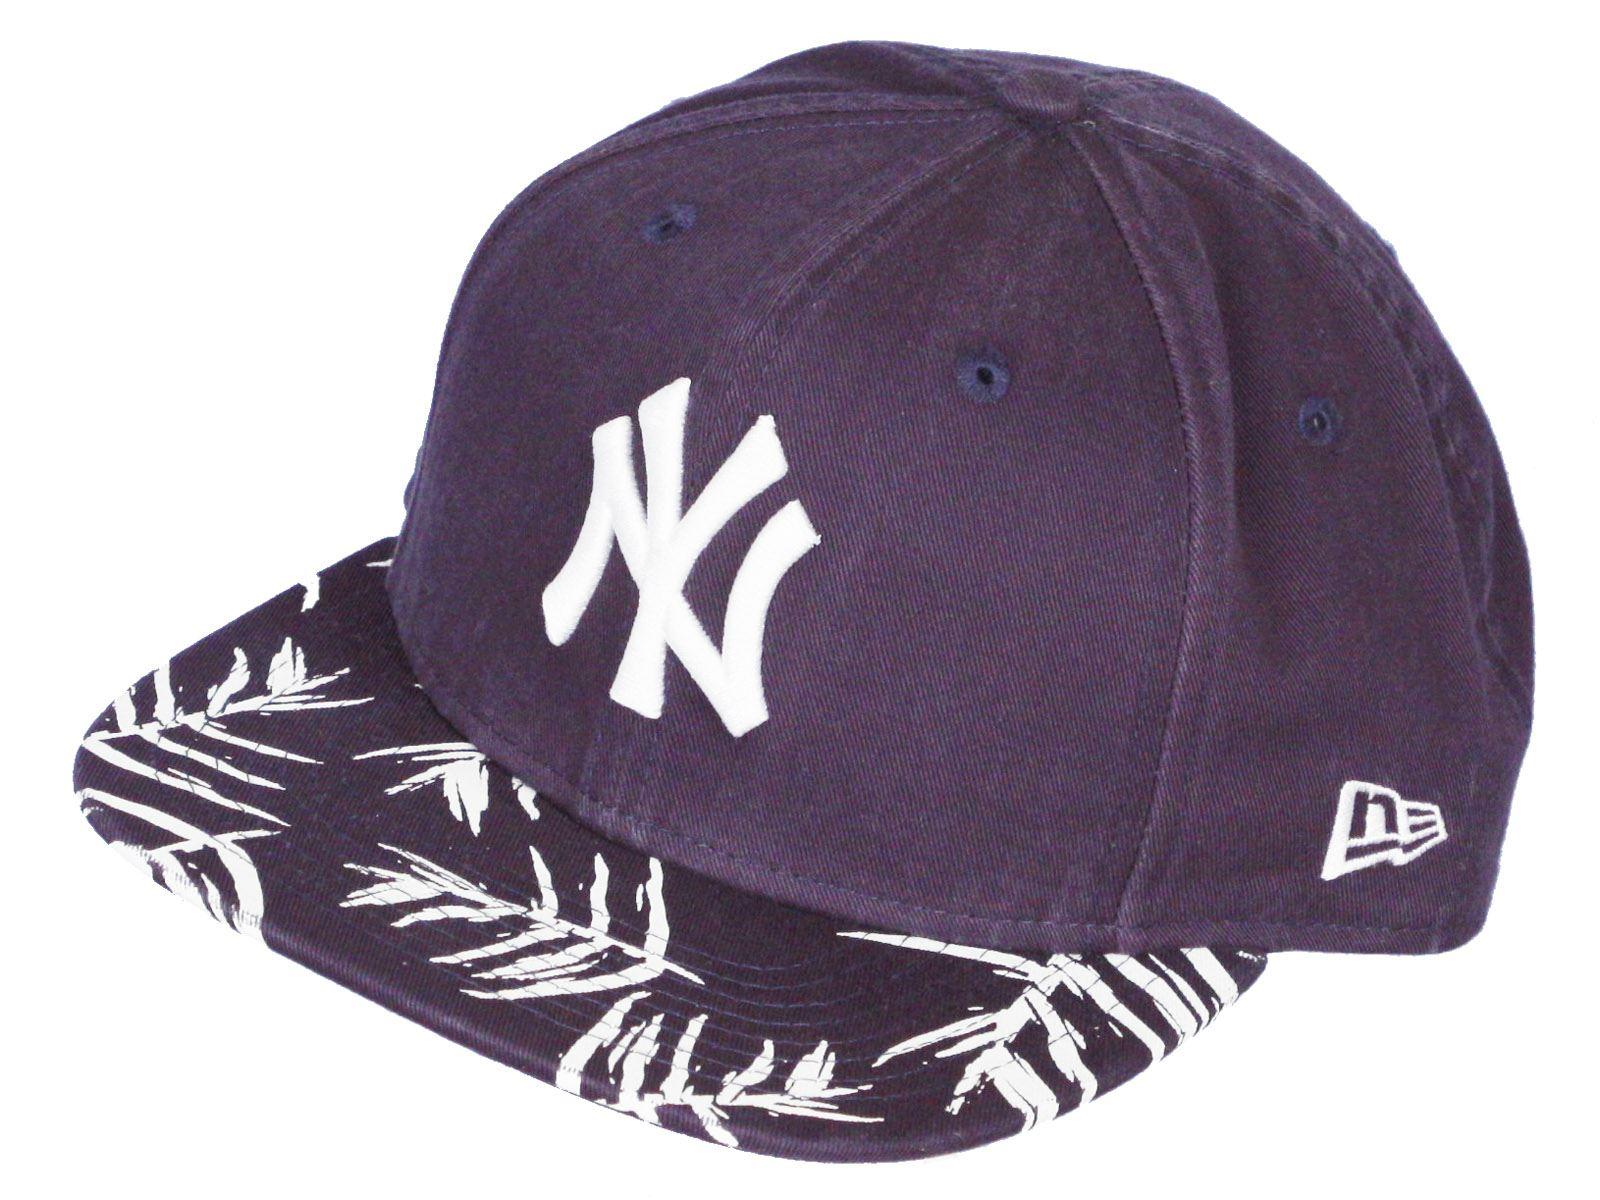 8ed84dc1e37 New Era Sandwash Visor Print 9Fifty Flatbill Cap ~ New York Yankees ...